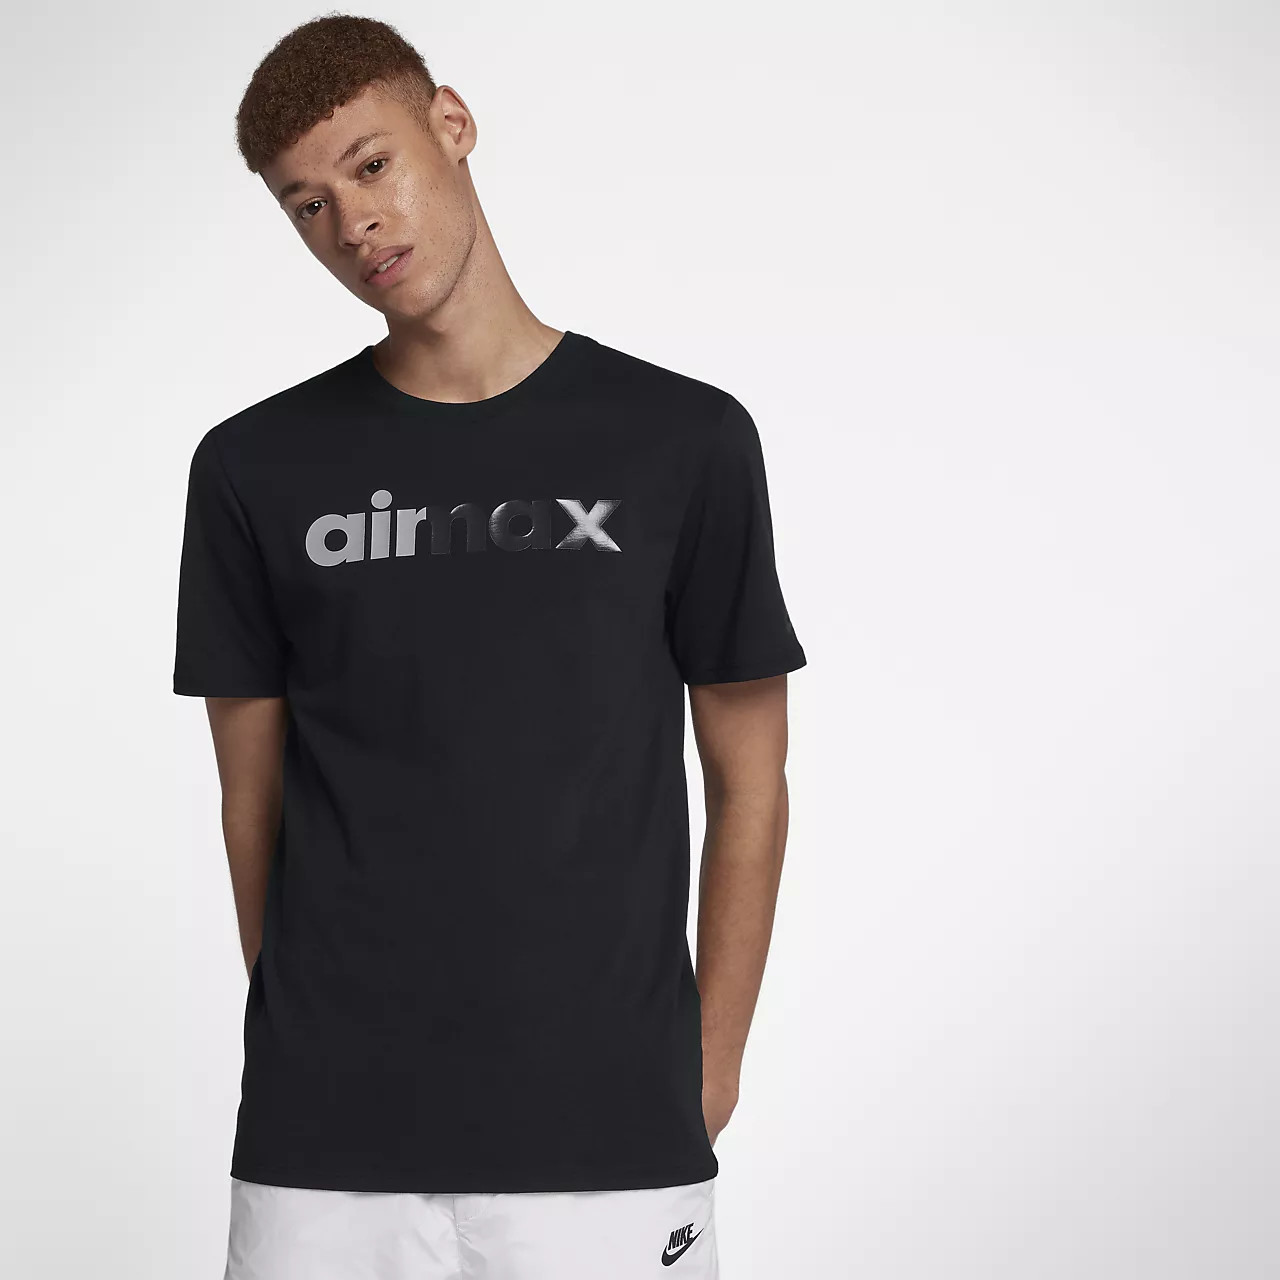 d9b9ec07 Футболка Nike Sportswear Air Max 95 Tee 892159-010 (Оригинал) - Football  Mall